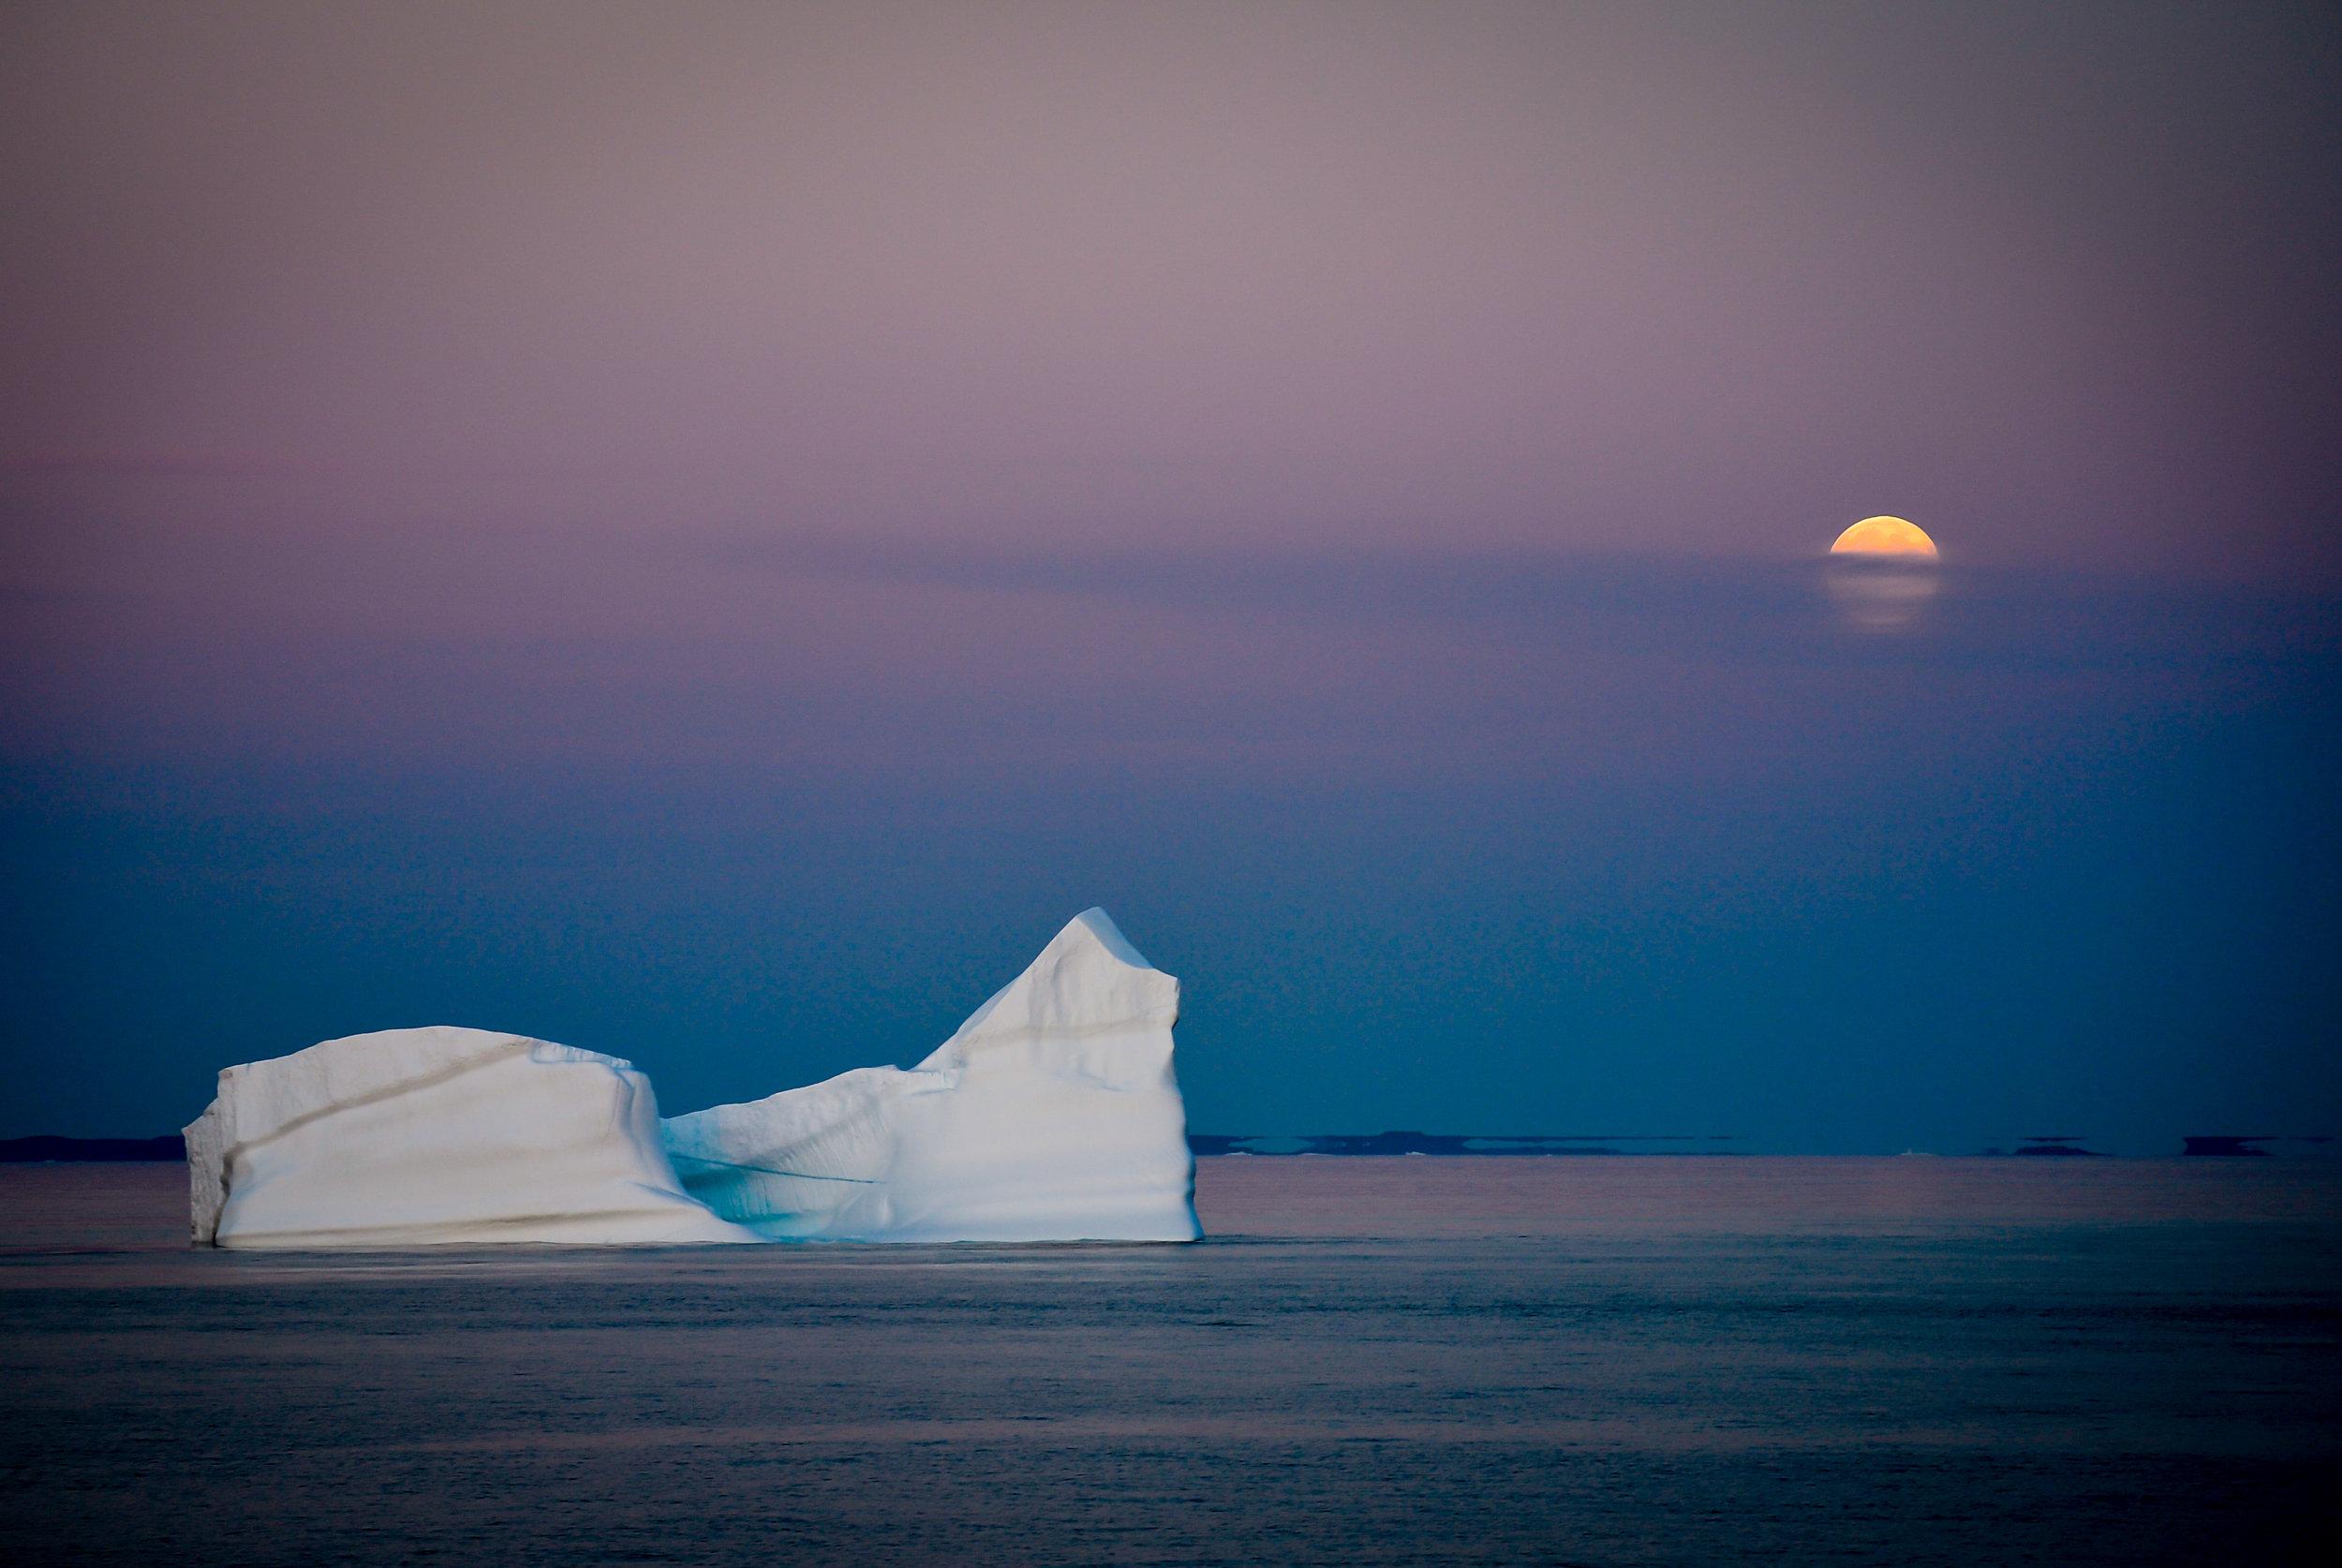 Iceberg and full moon off the coast of Greenland